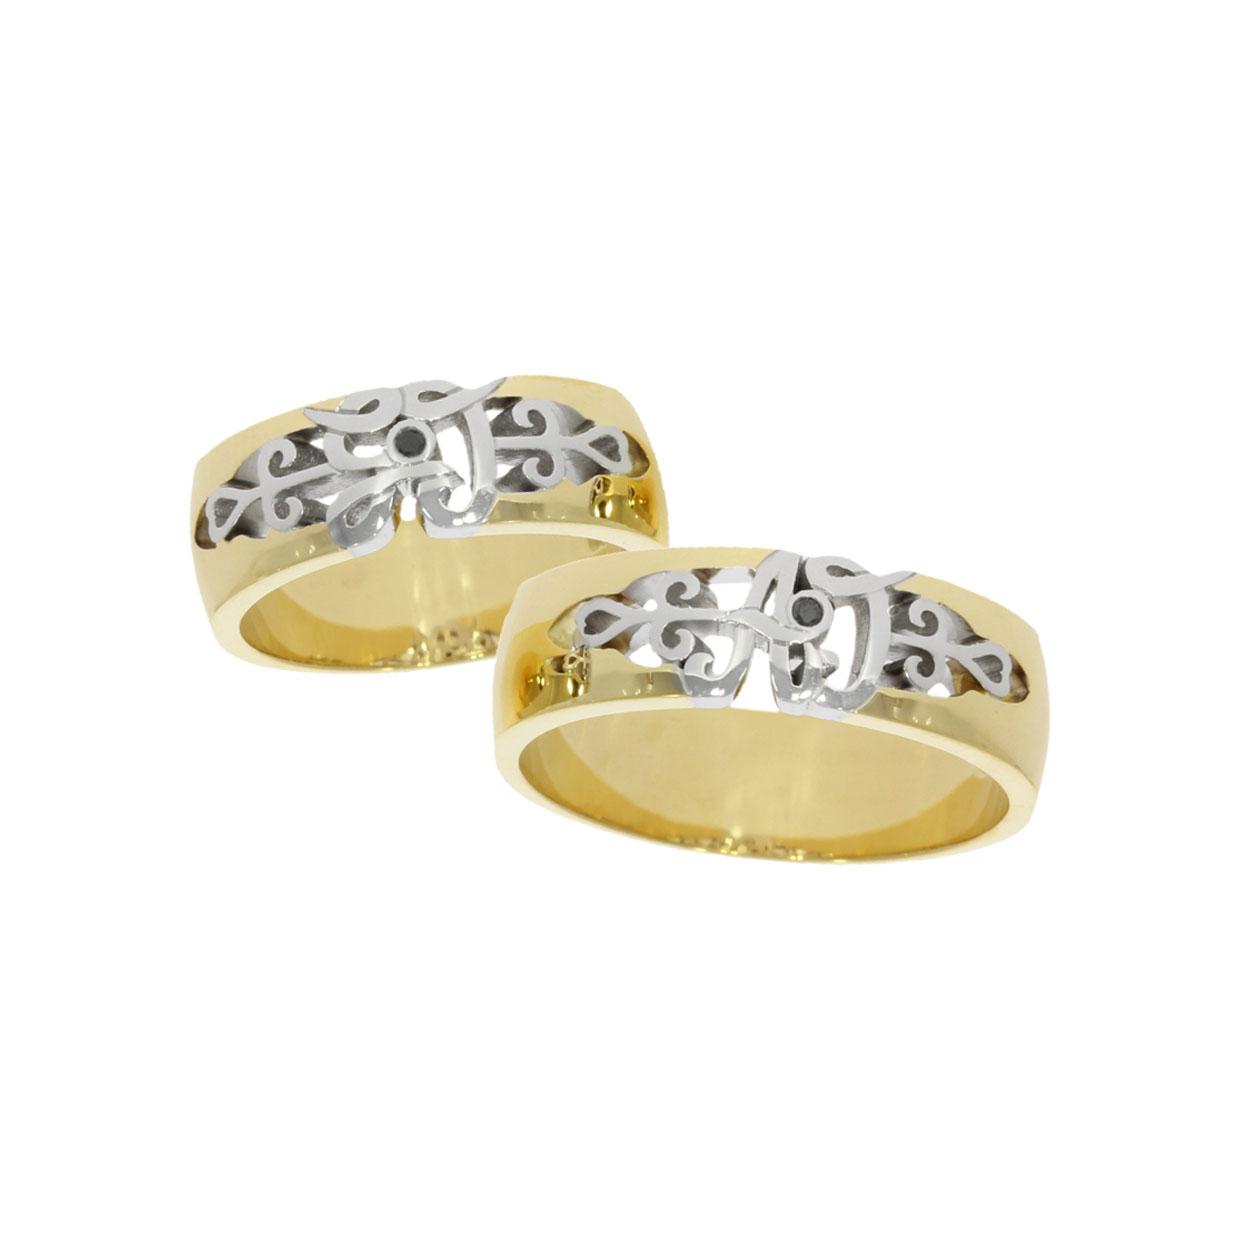 ornate initials personalised custom bespoke matching wedding rings bath bristol uk